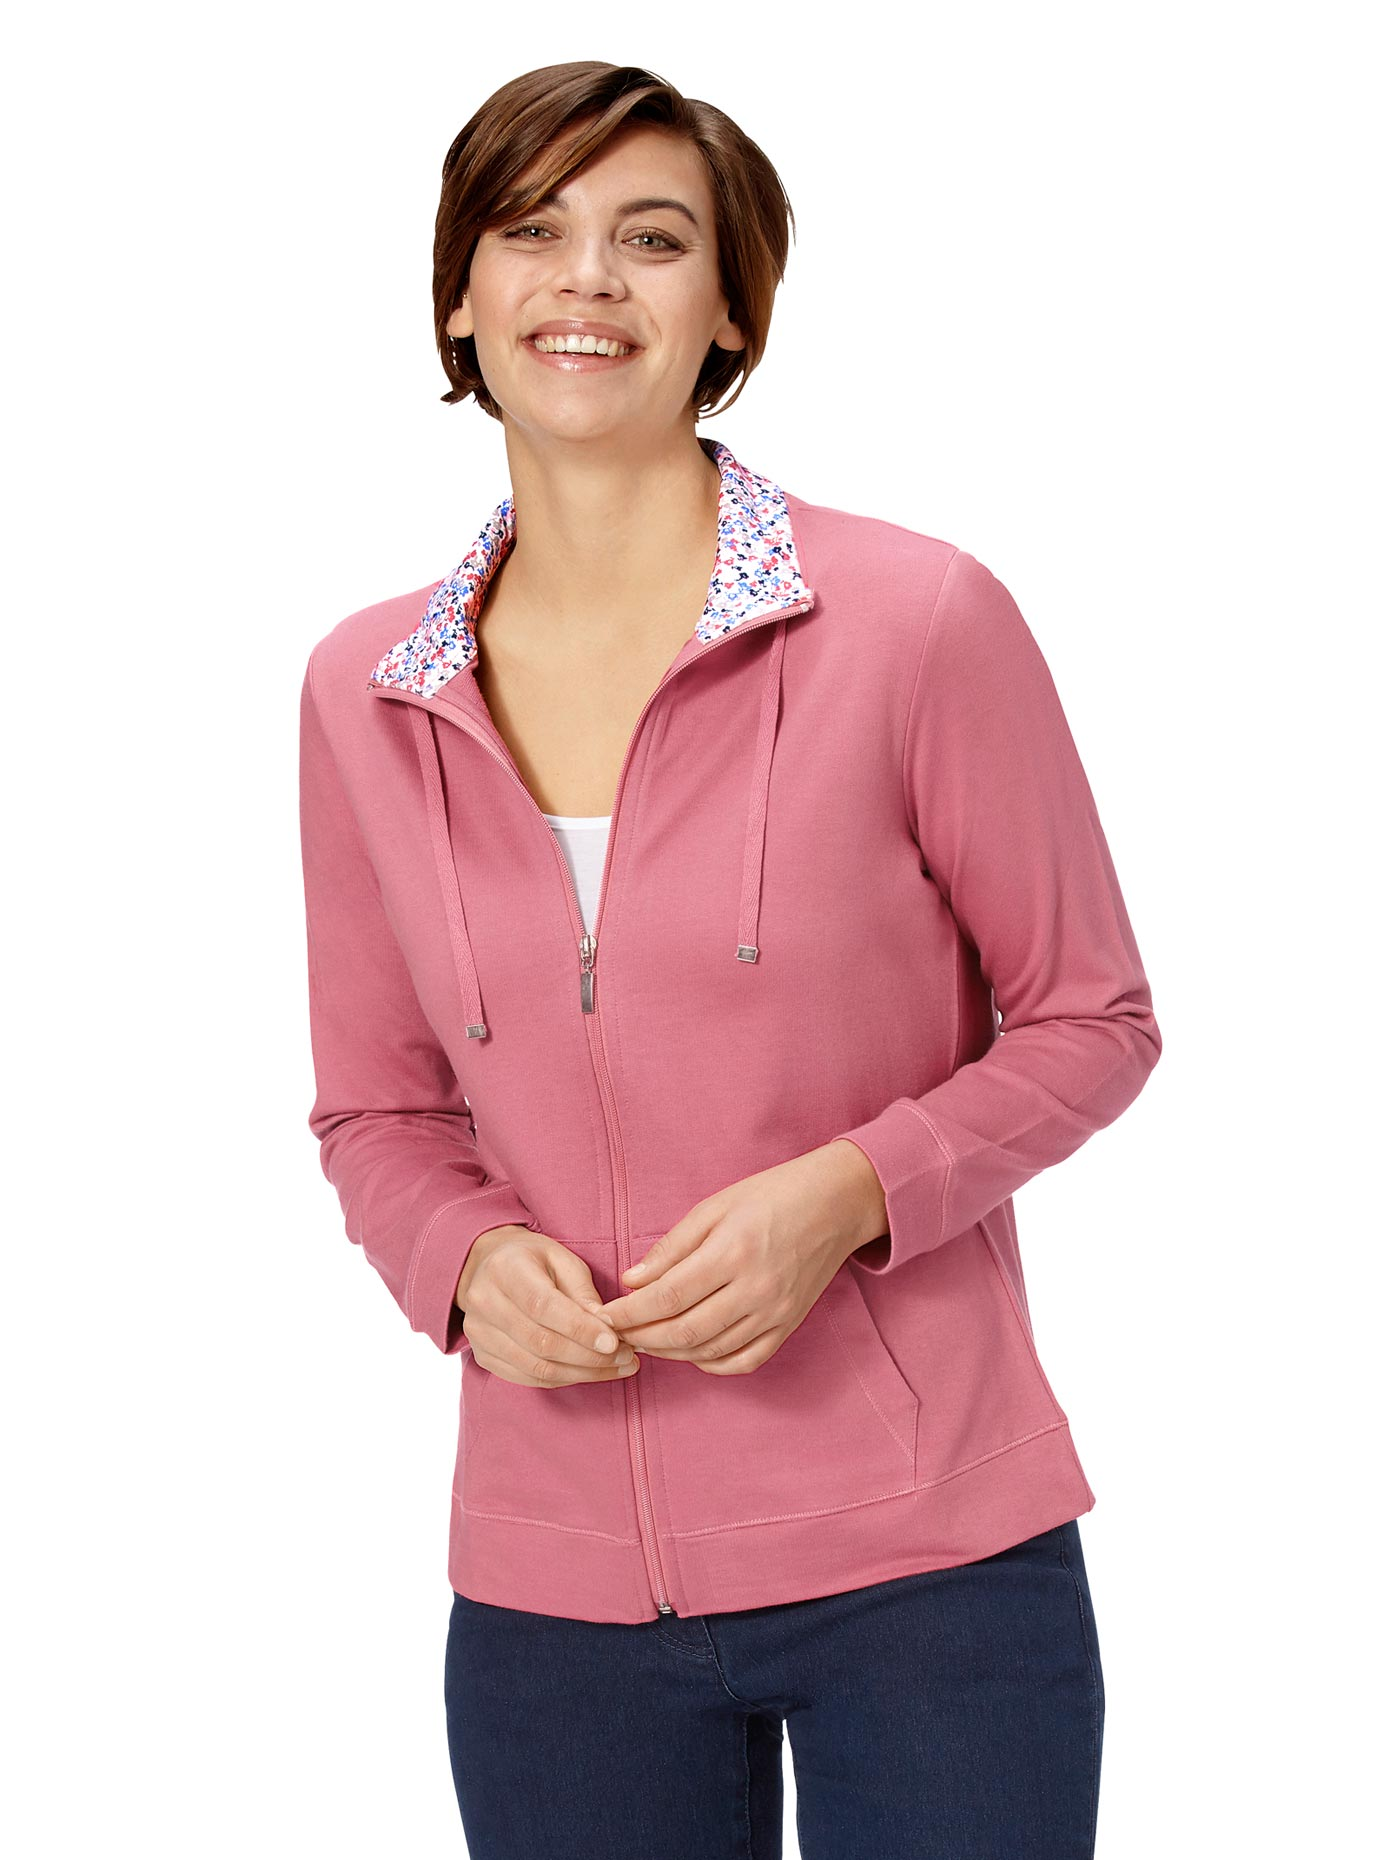 Classic Basics Shirtjacke mit Millefleurs-Blende | Bekleidung > Shirts > Shirtjacken | Classic Basics